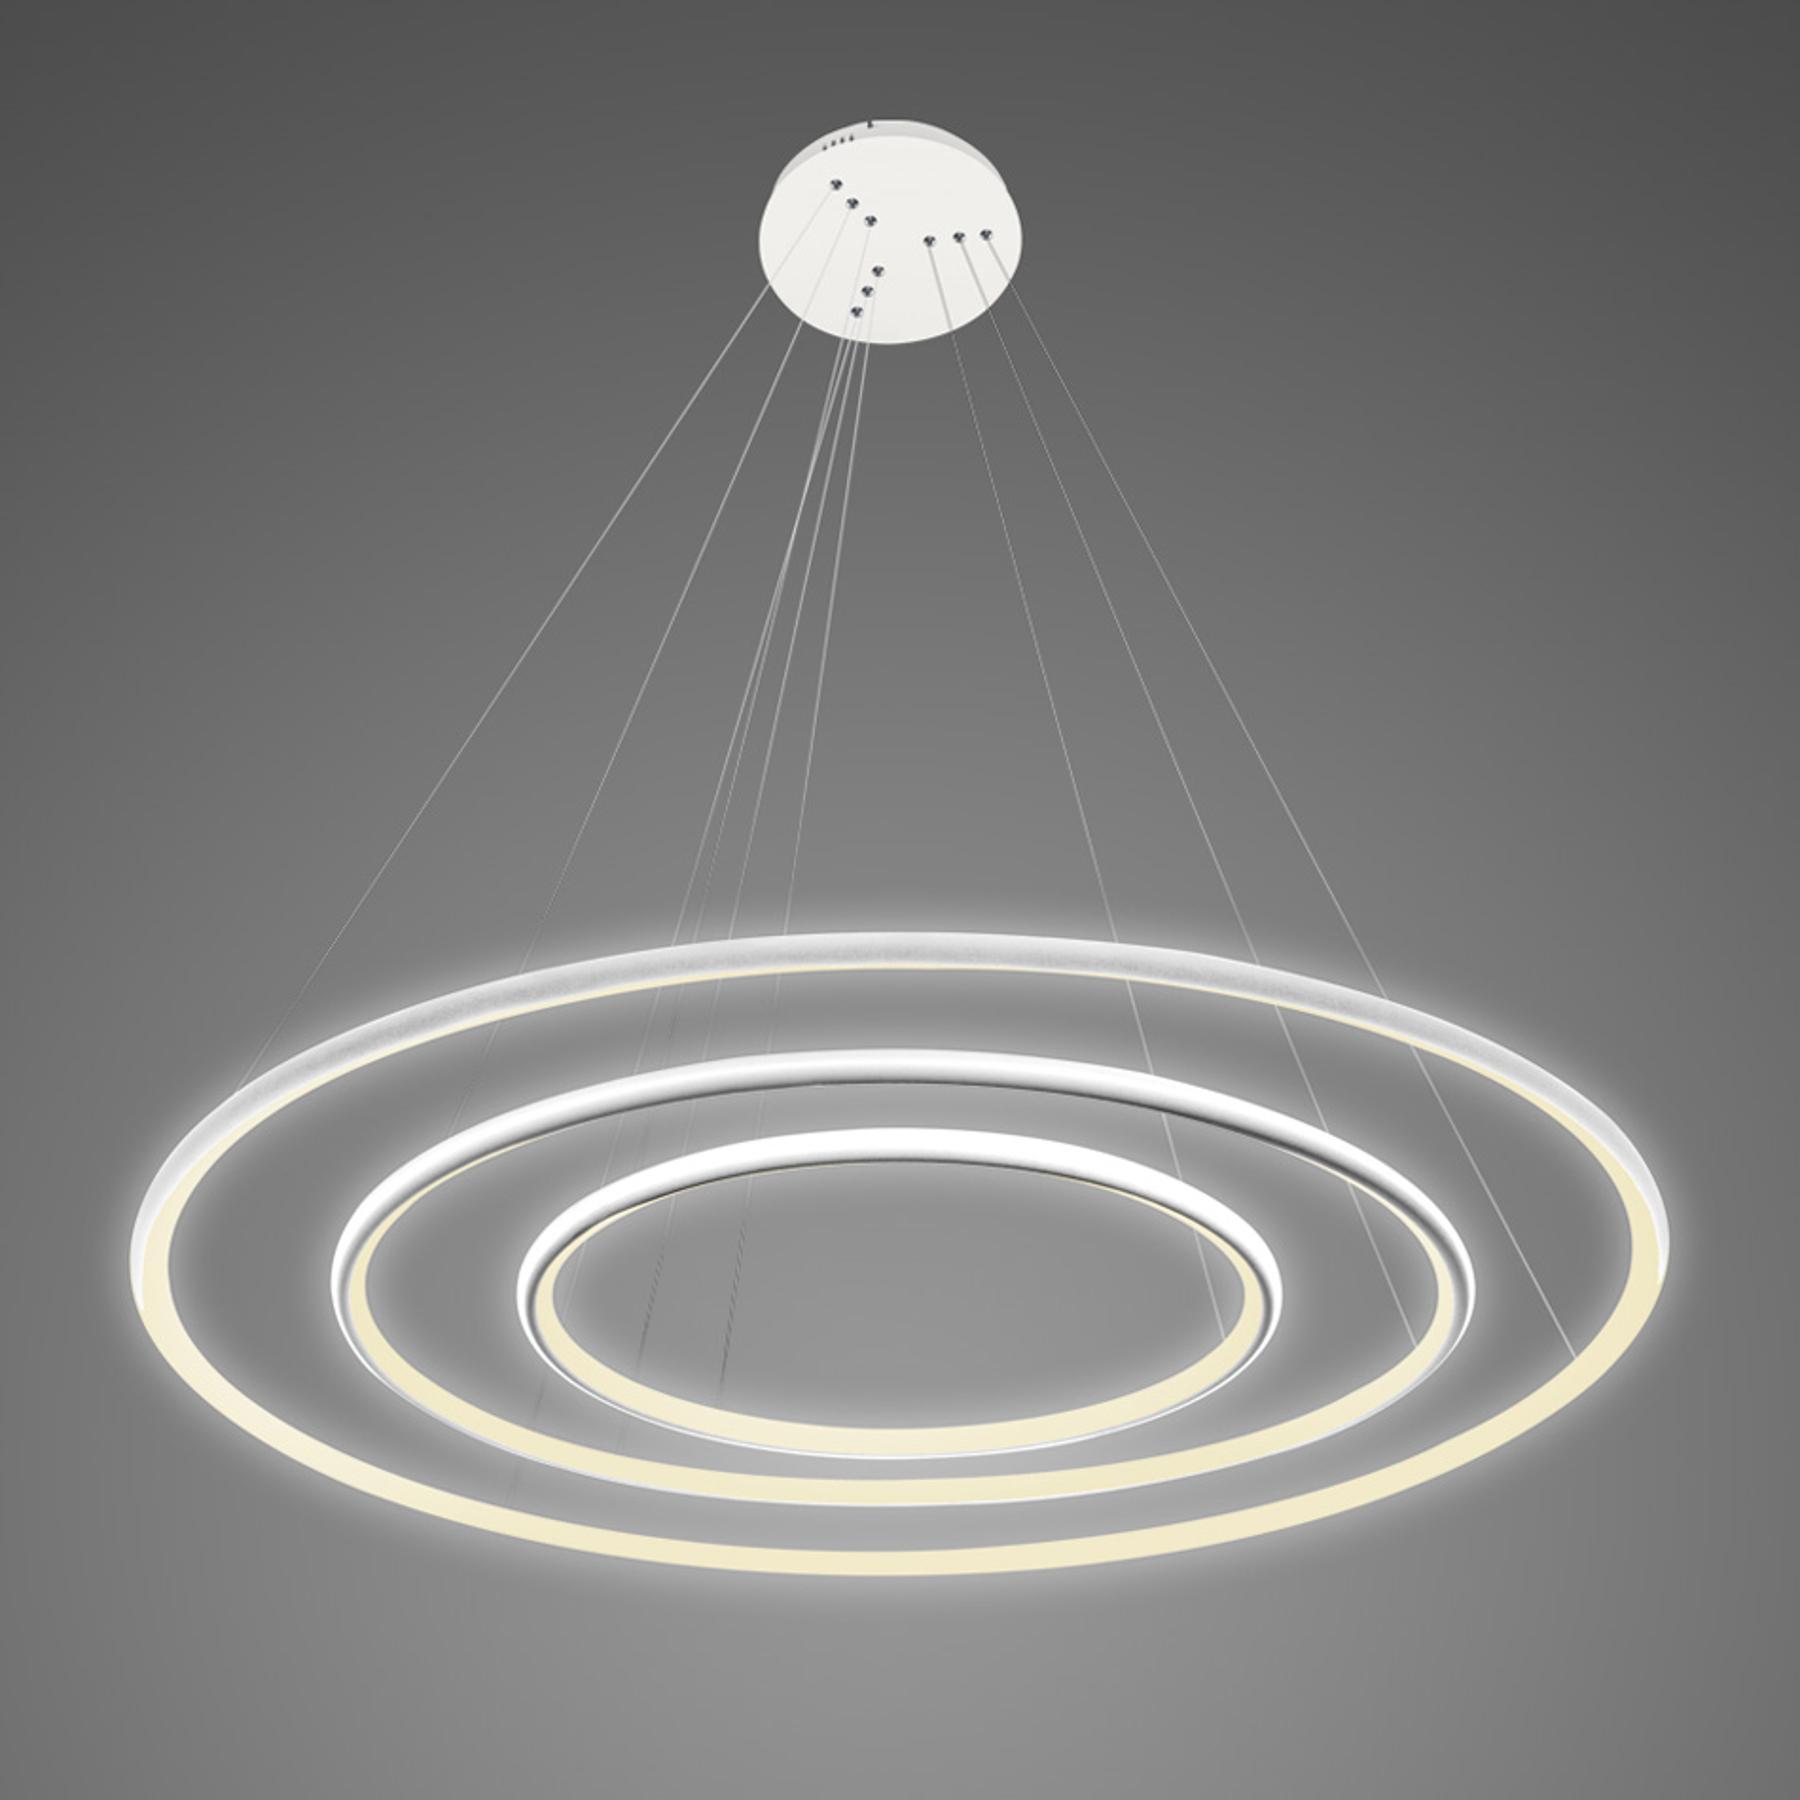 Lampa wisząca LA075 3-pkt. 80cm biała 3000K